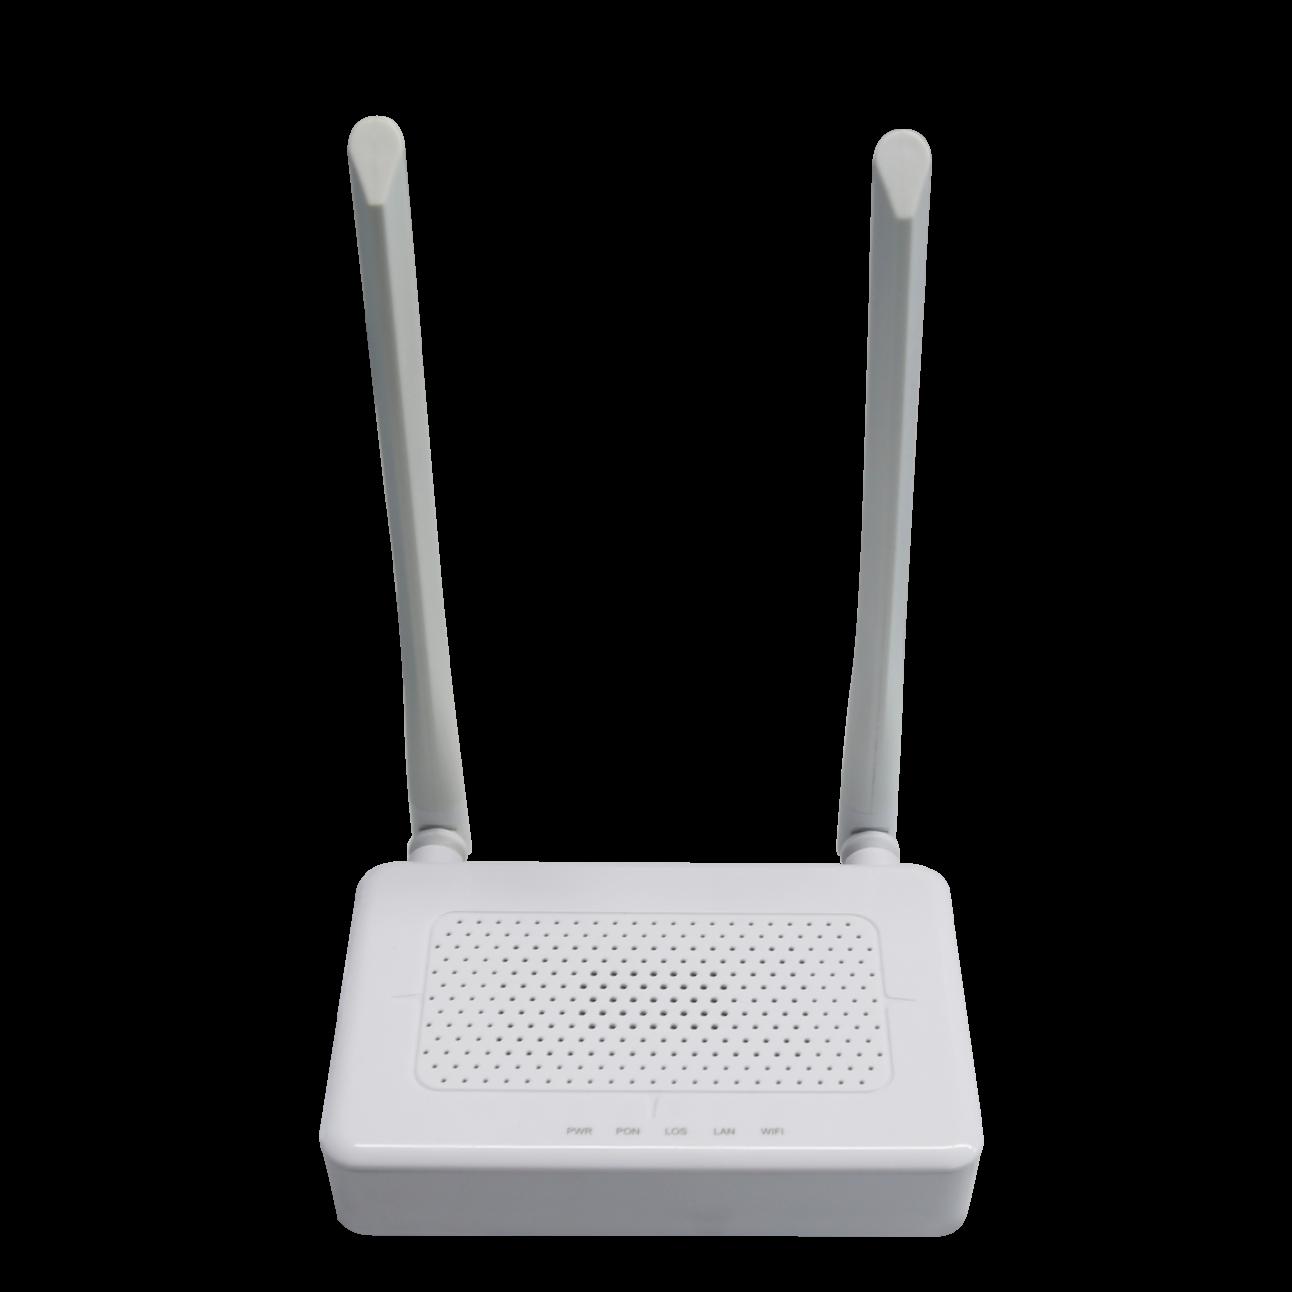 Абонентский терминал ONU GPON, 1 порт 10/100/1000Base-T, WiFi